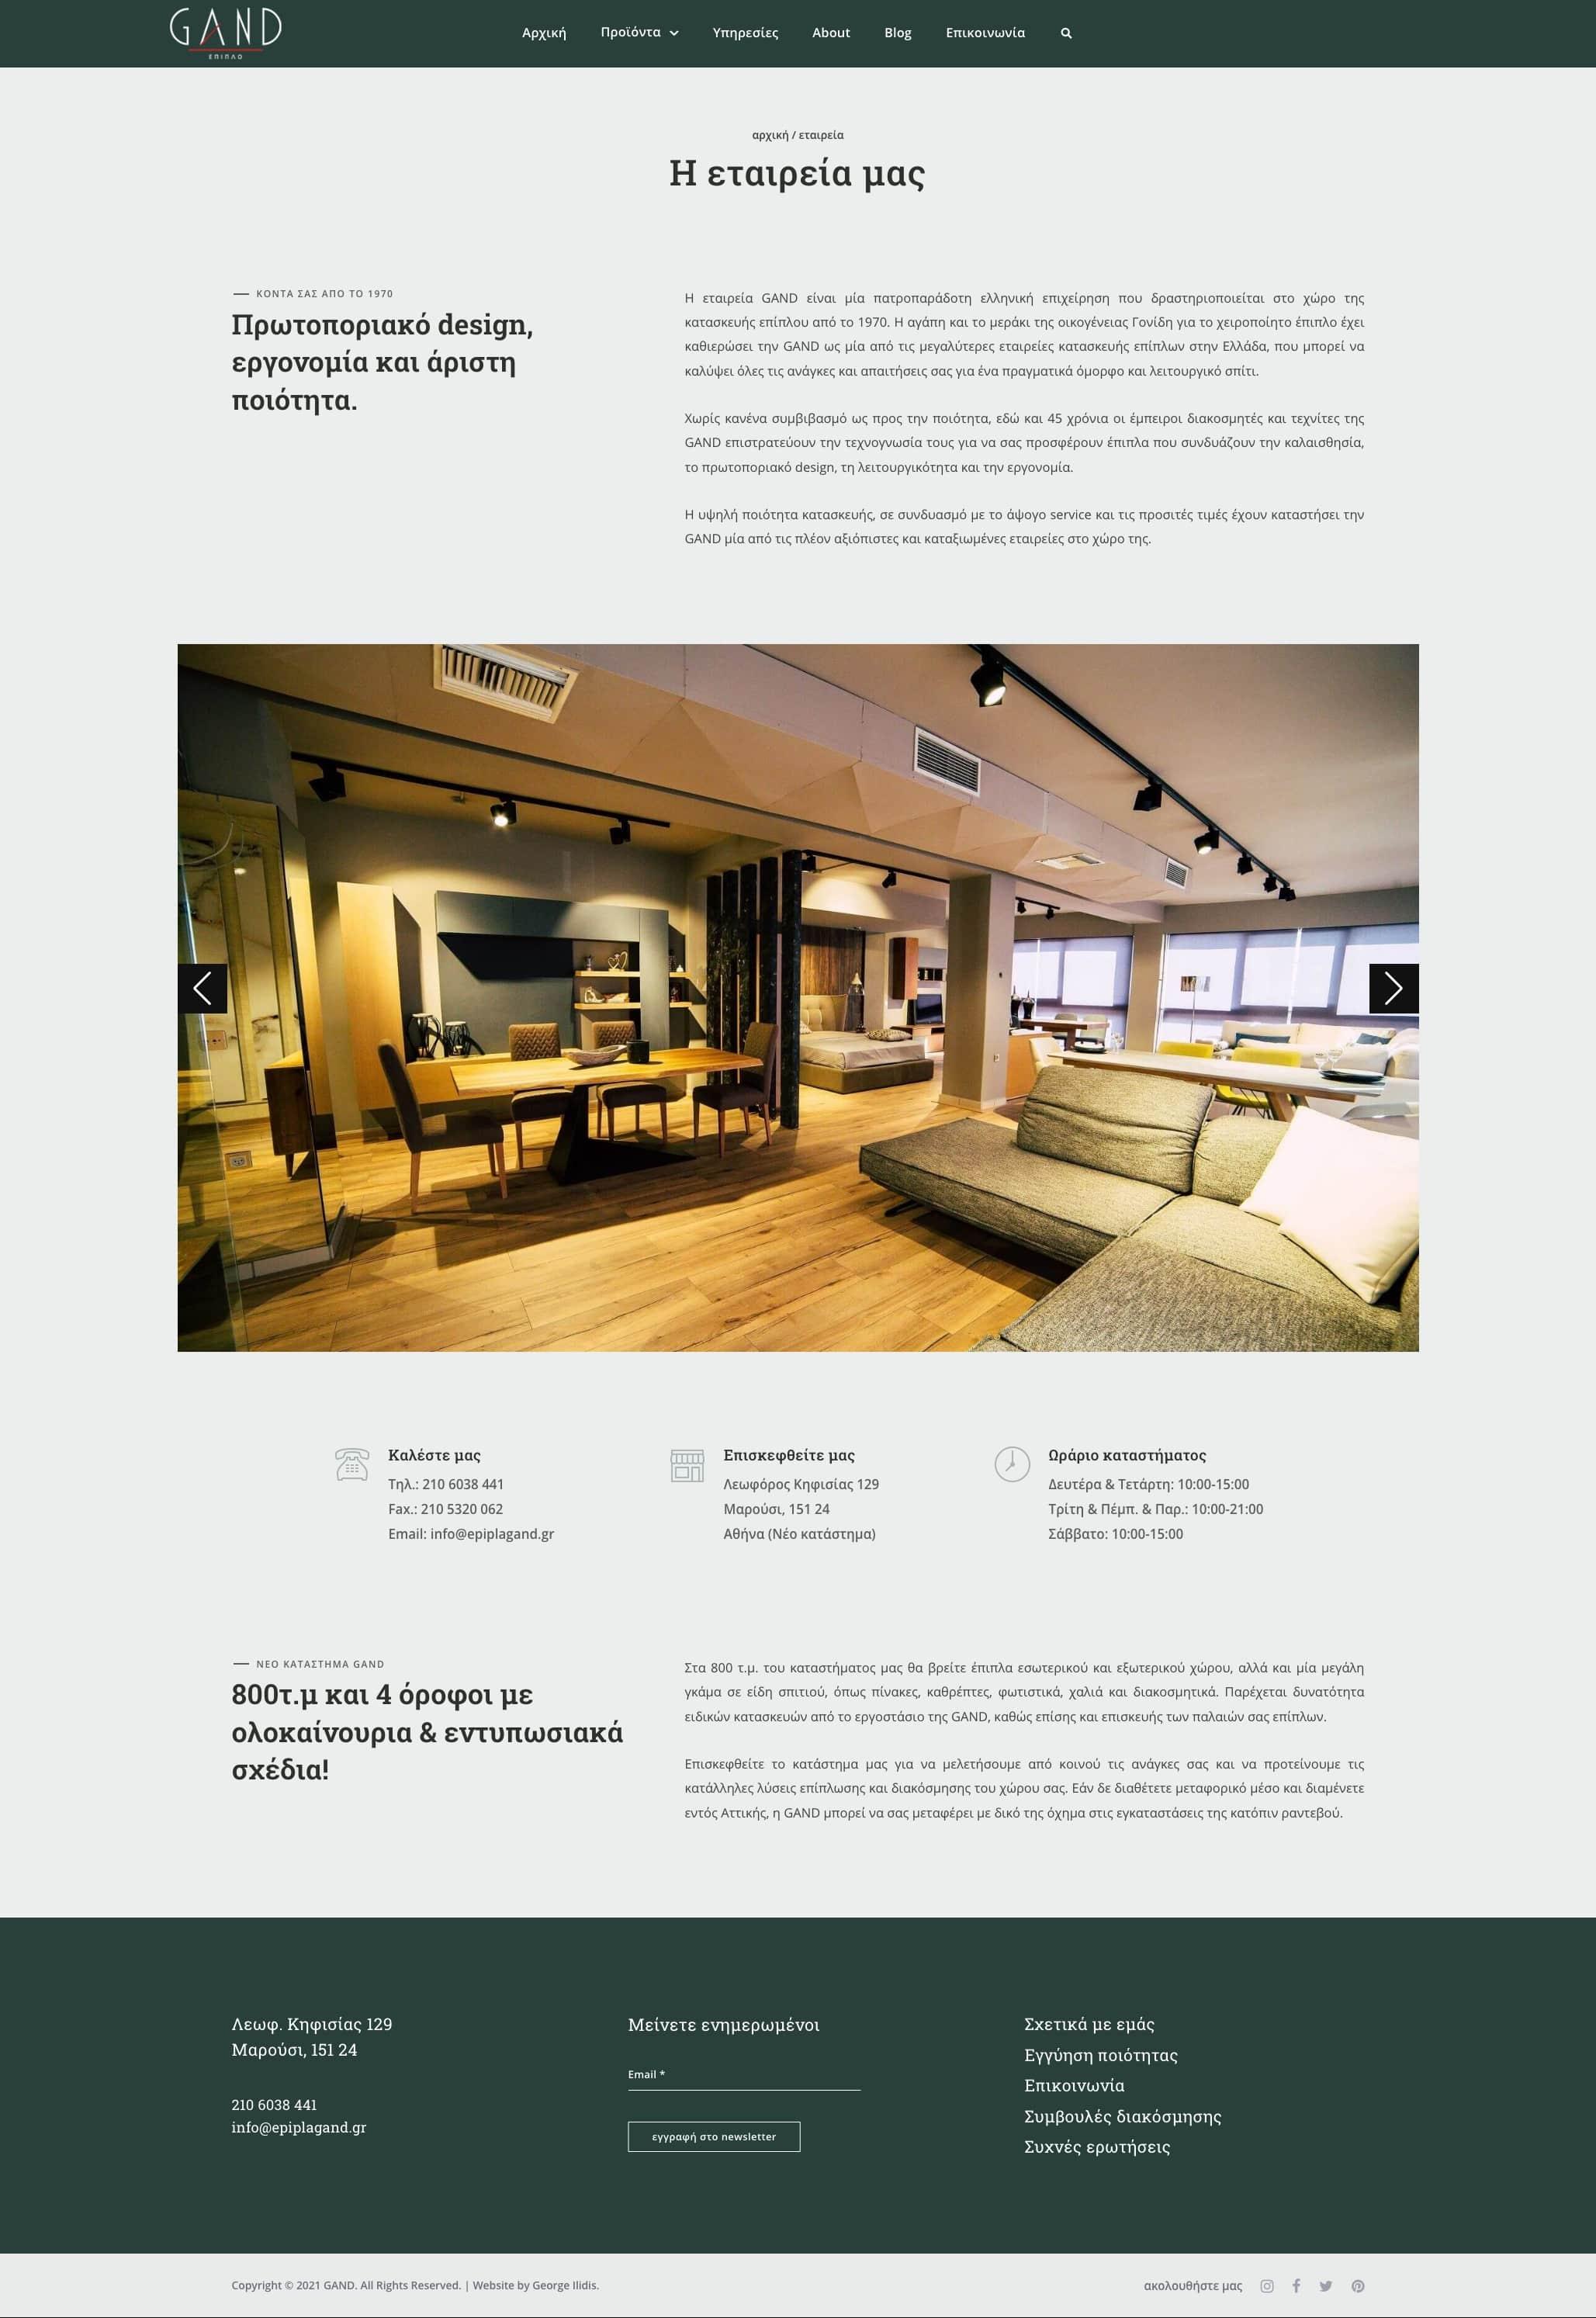 Custom WordPress Website Design & Development - About Page - GAND Furniture